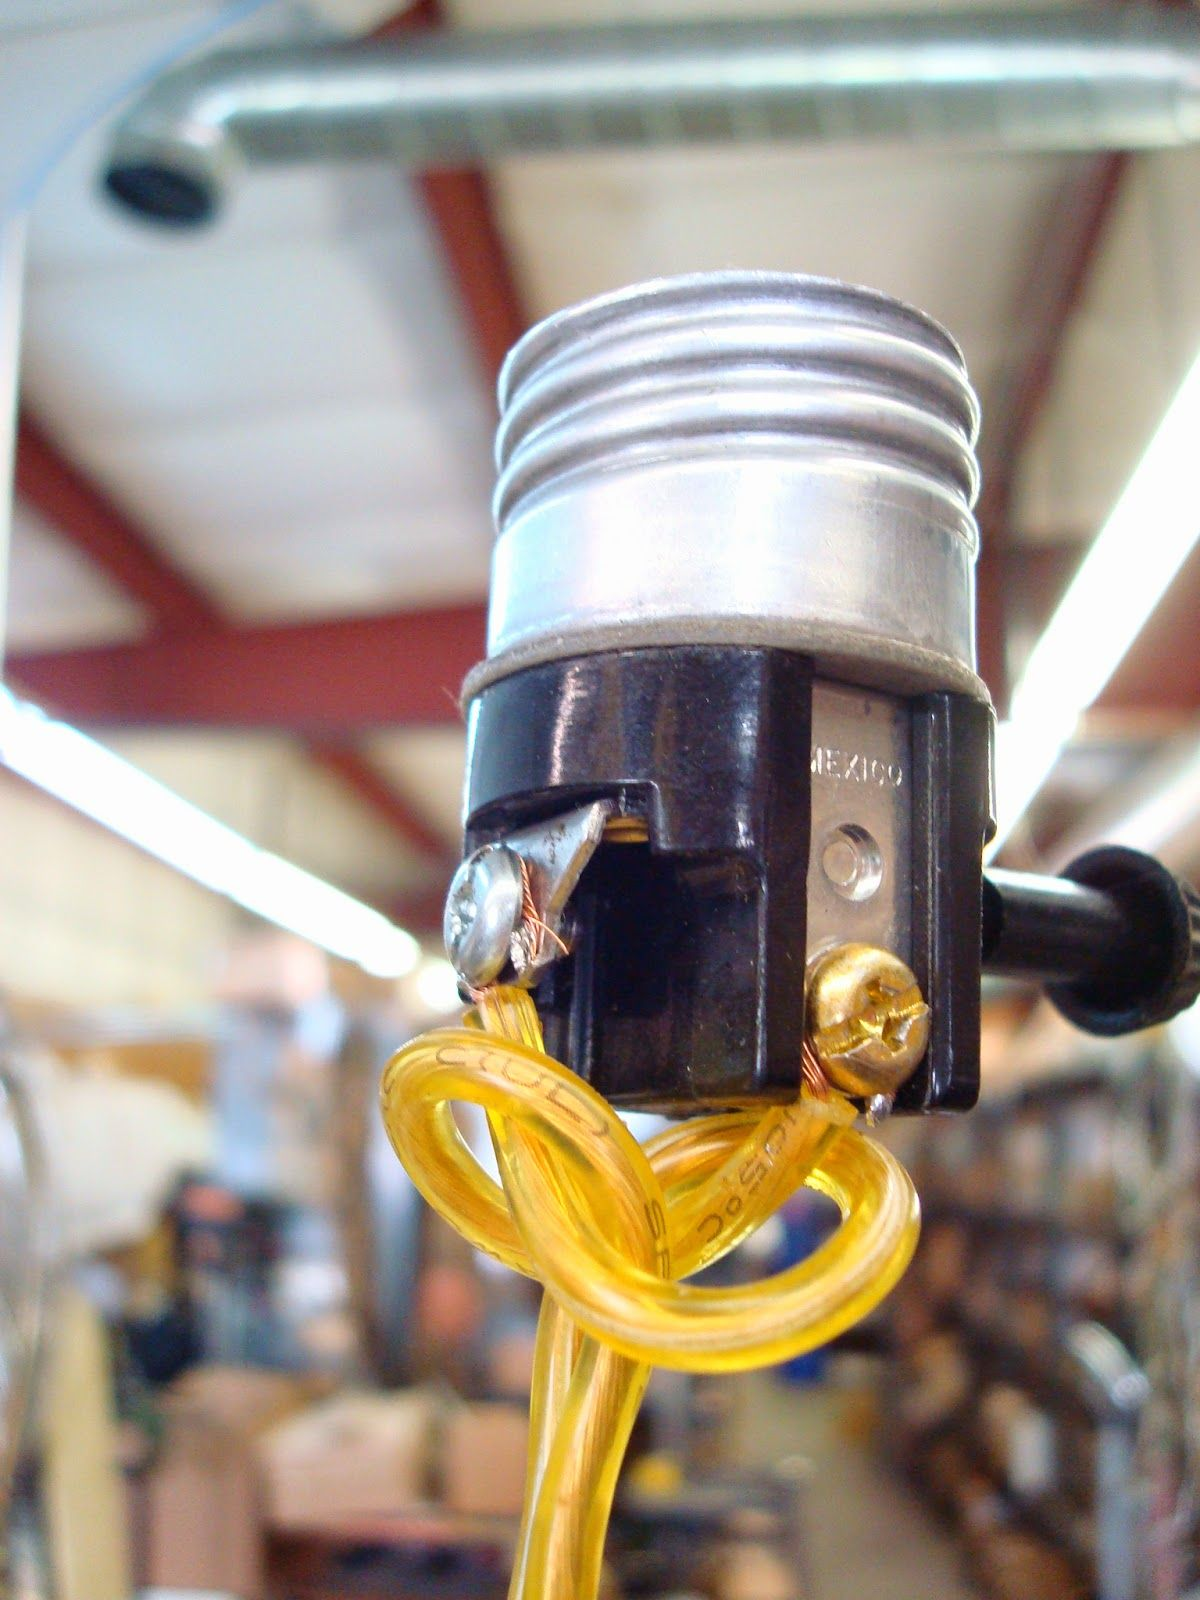 Explore Lamp Socket, Light Bulb, And More!